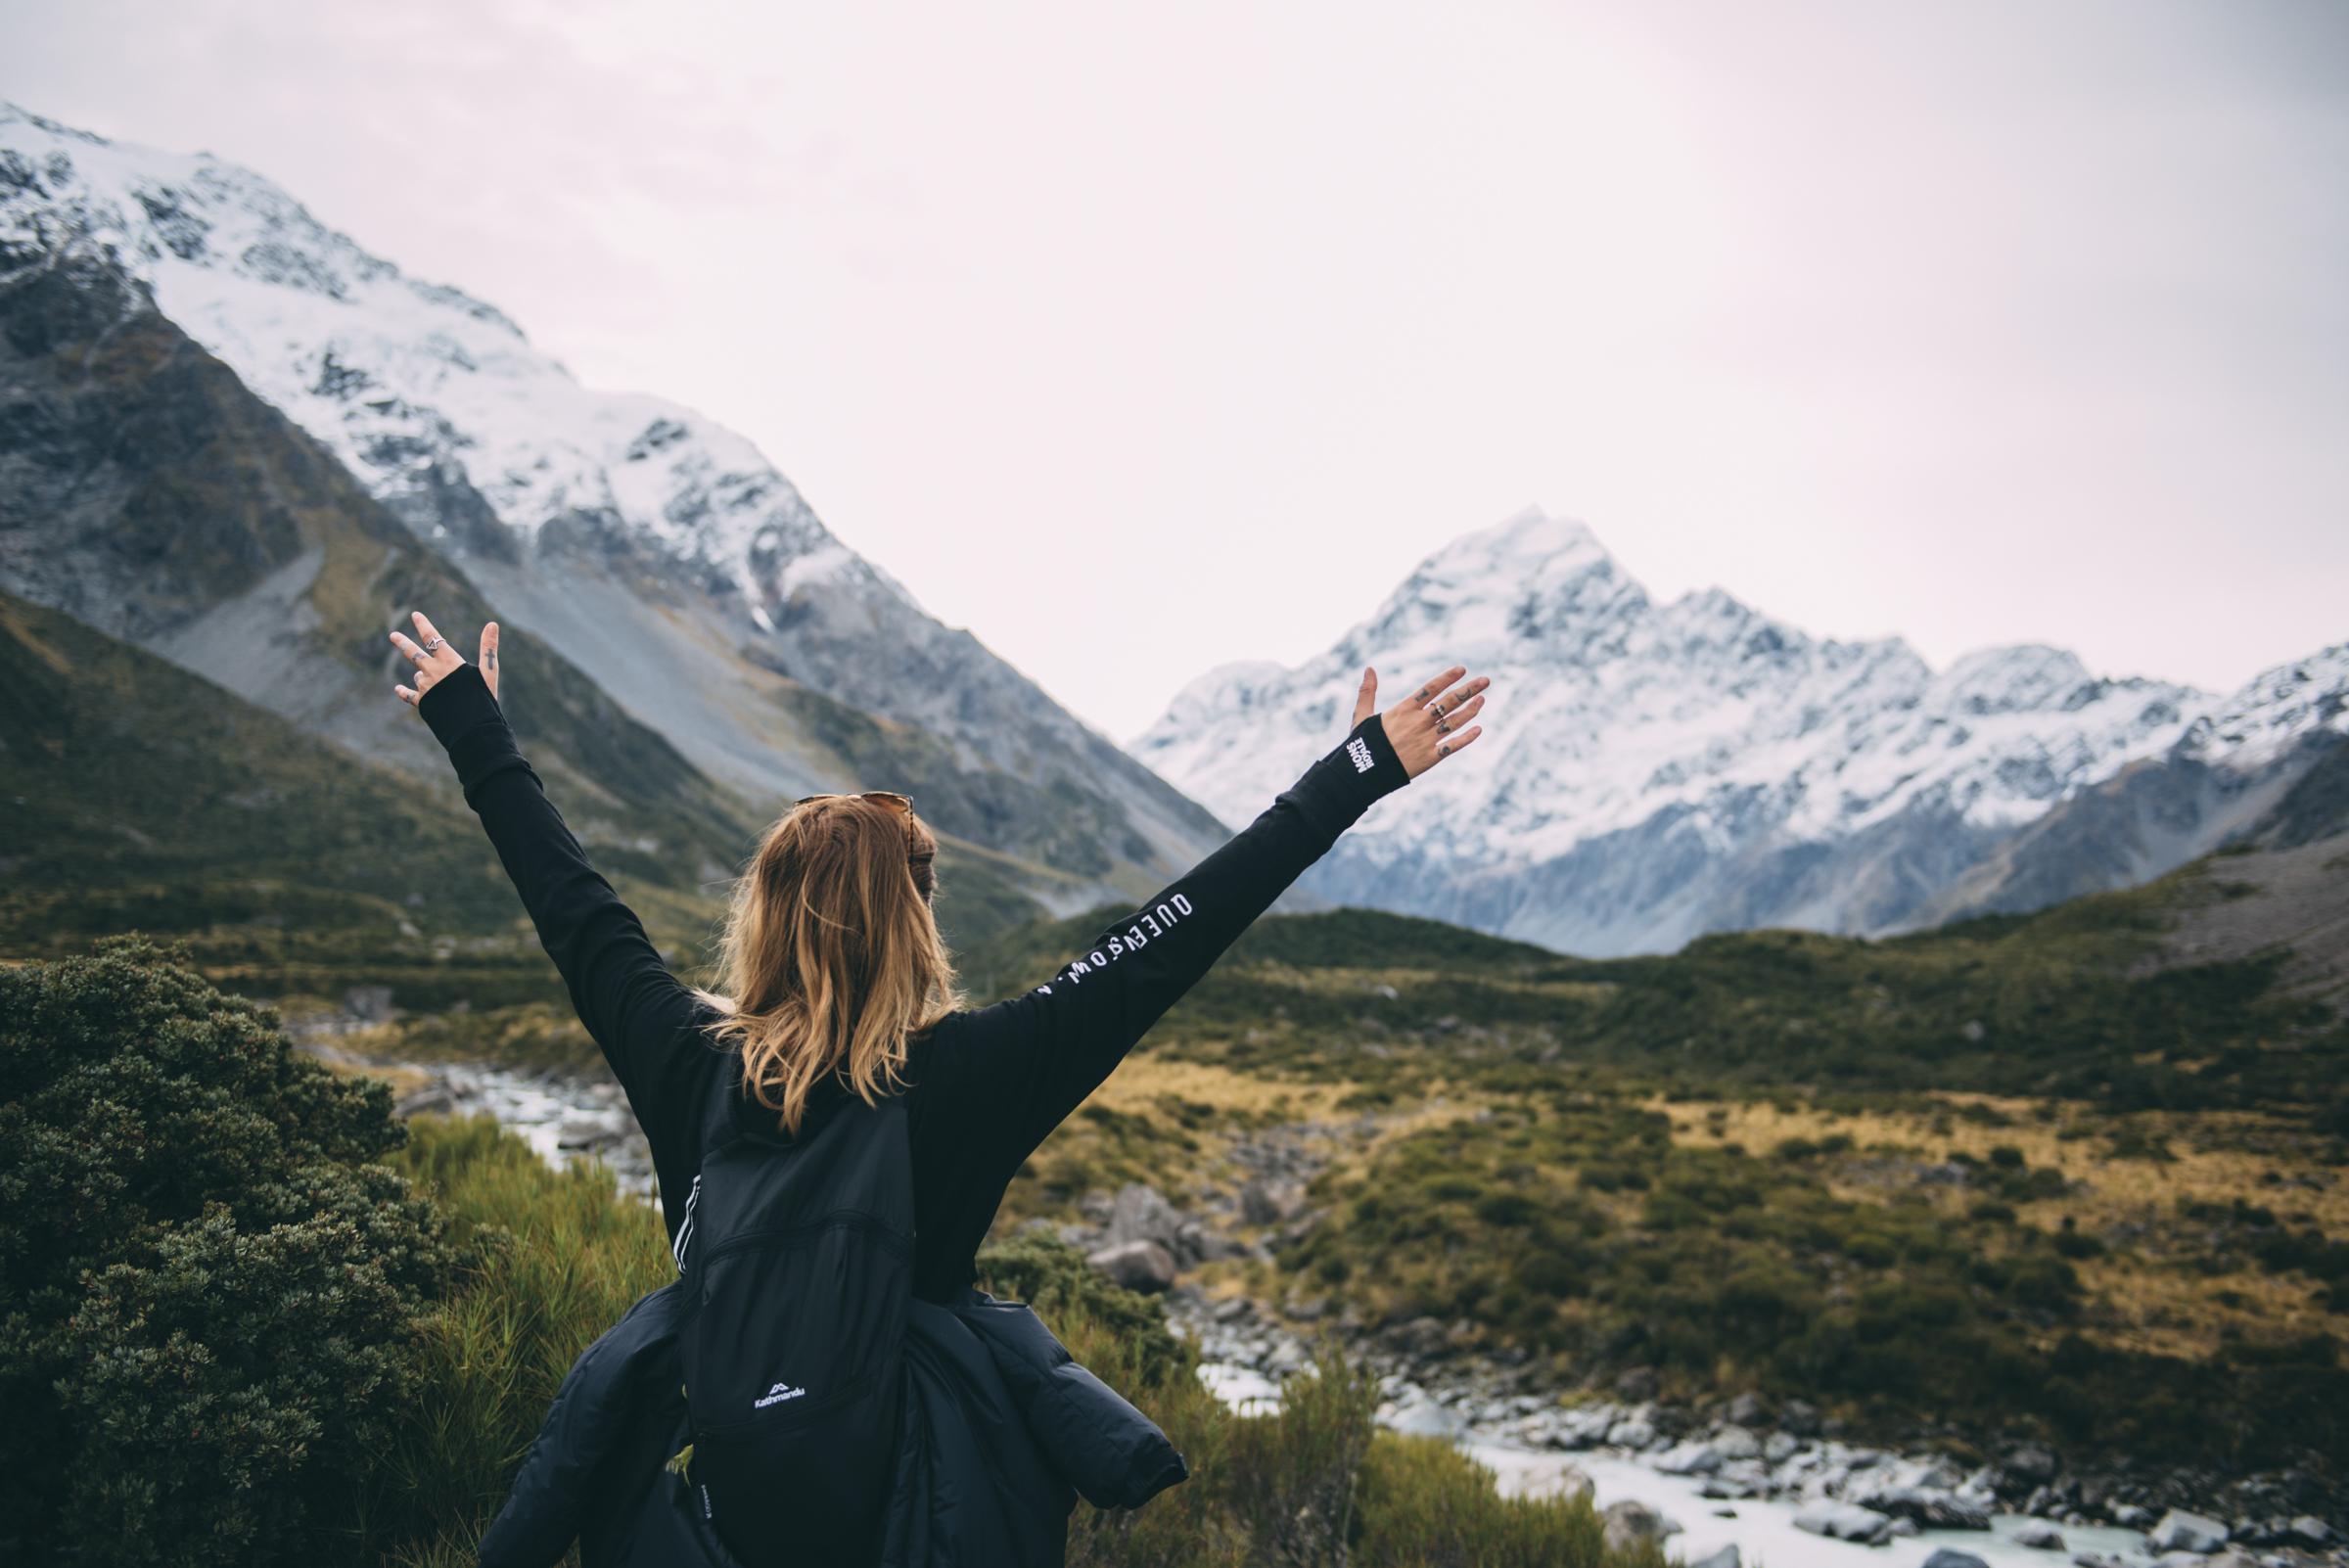 New Zealand Road Trip Lola Photography WEB_031.jpg